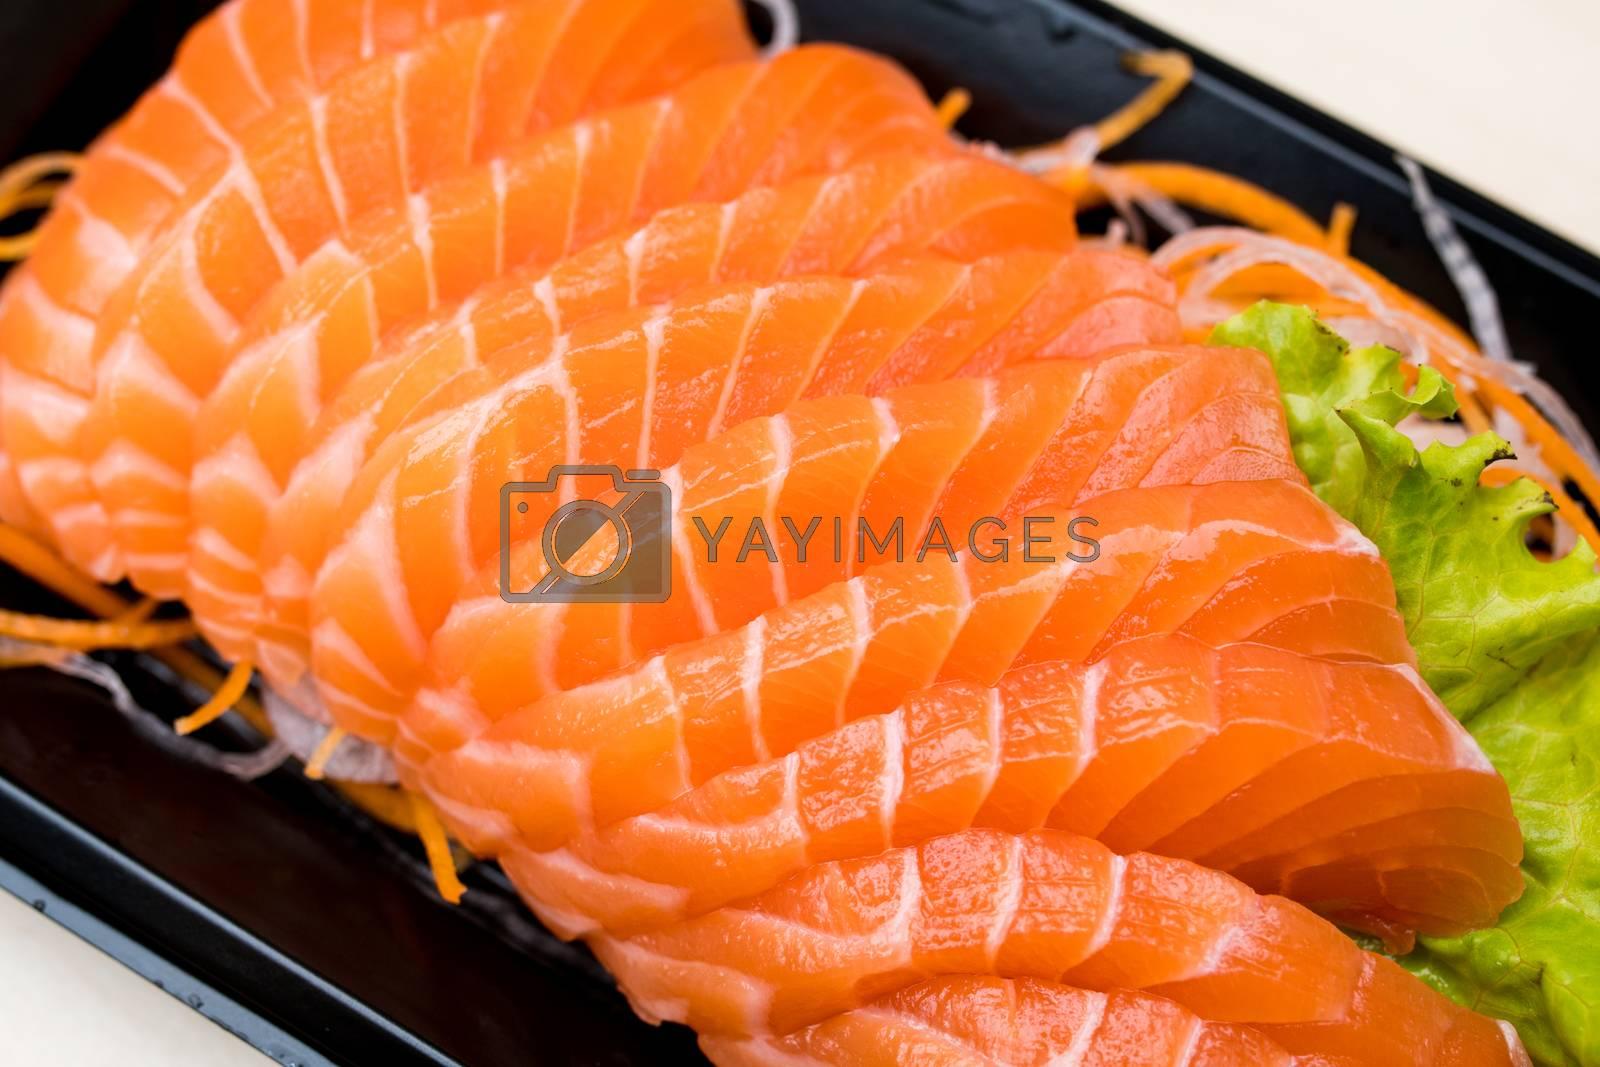 Royalty free image of sliced salmon sashimi on black plate by antpkr